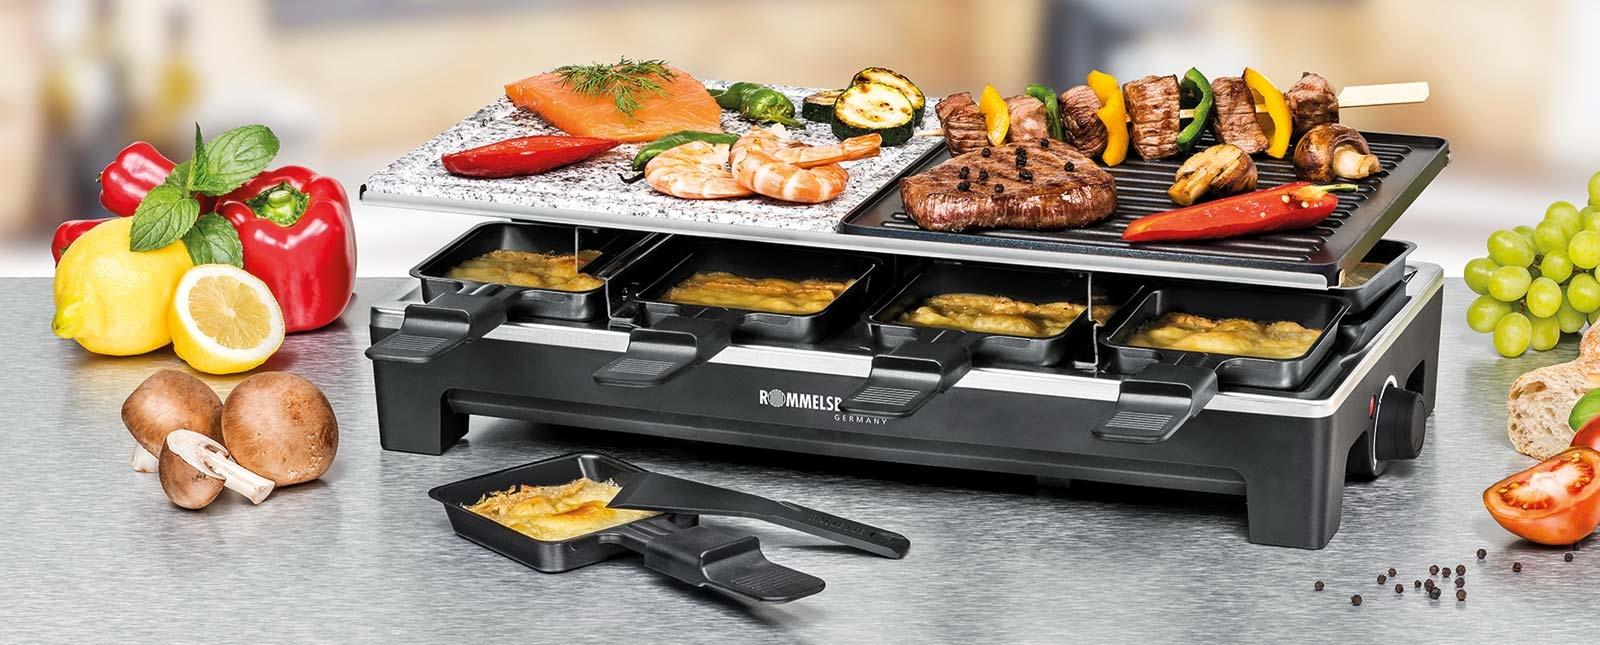 Rommelsbacher-RCS1350-Raclette-Grill-Header